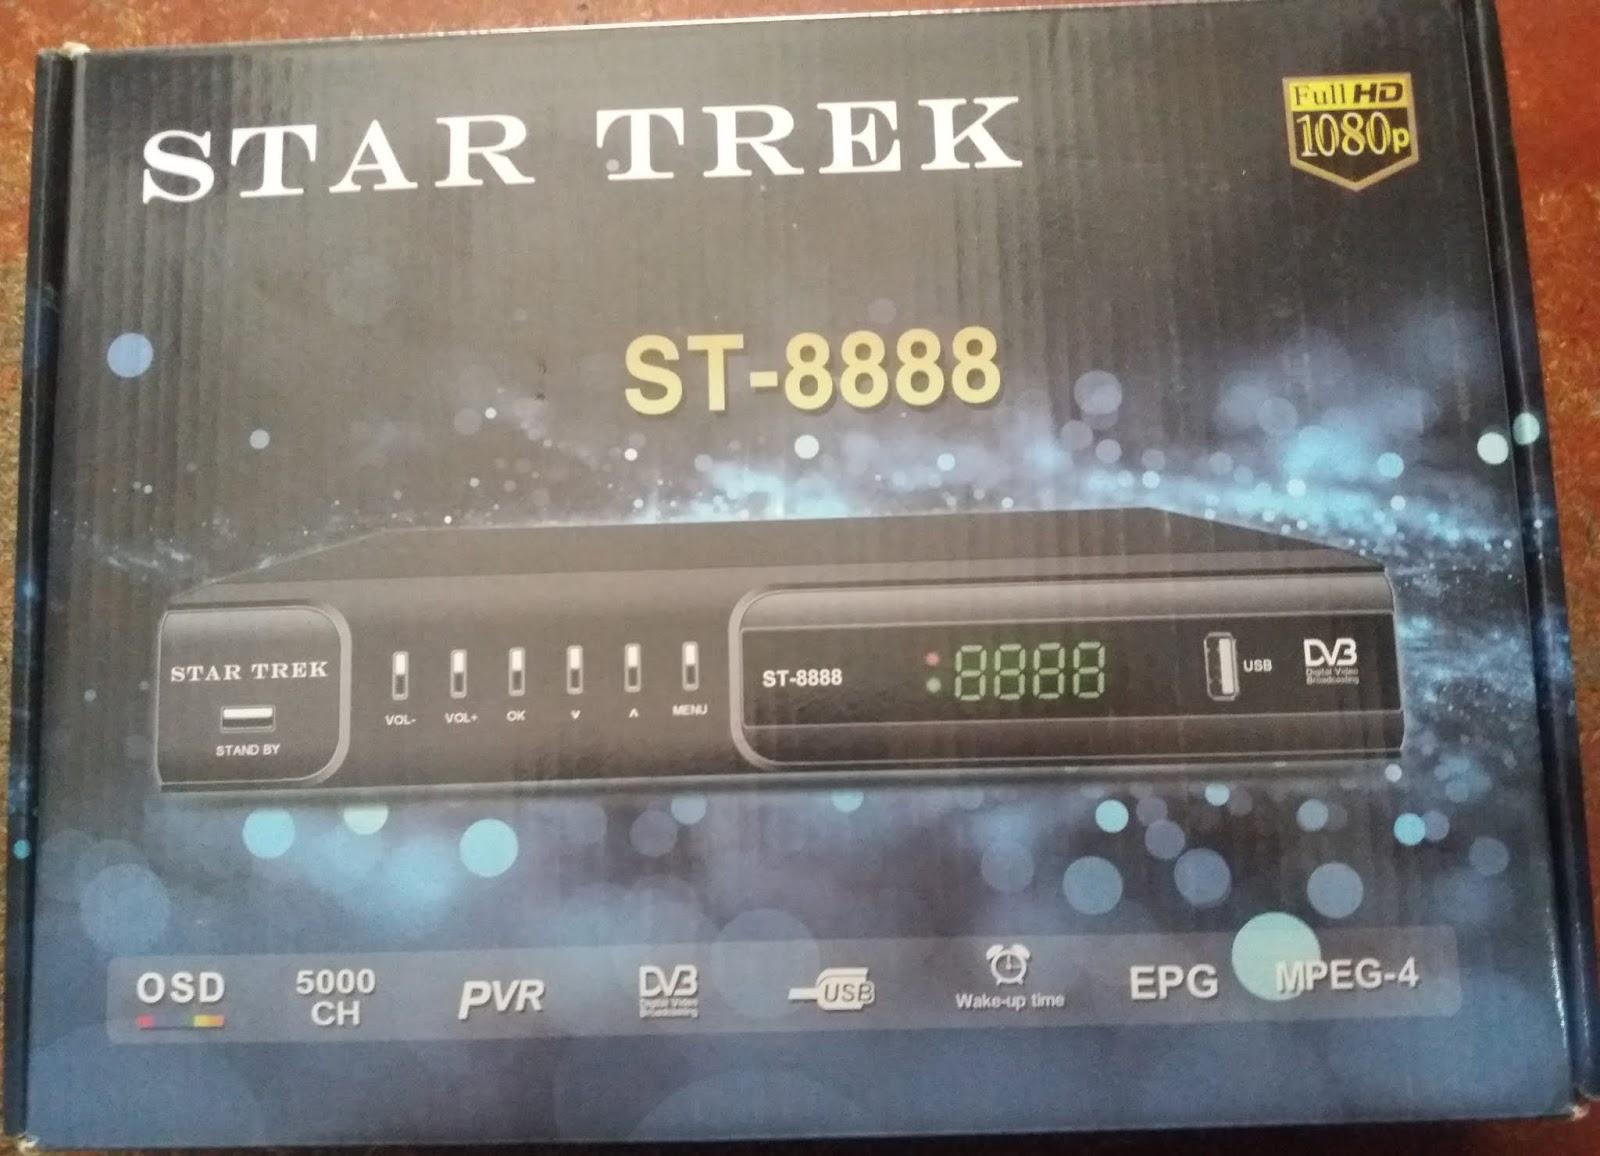 All Dish Receiver Software: STAR TREK ST-8888 HD RECEIVER